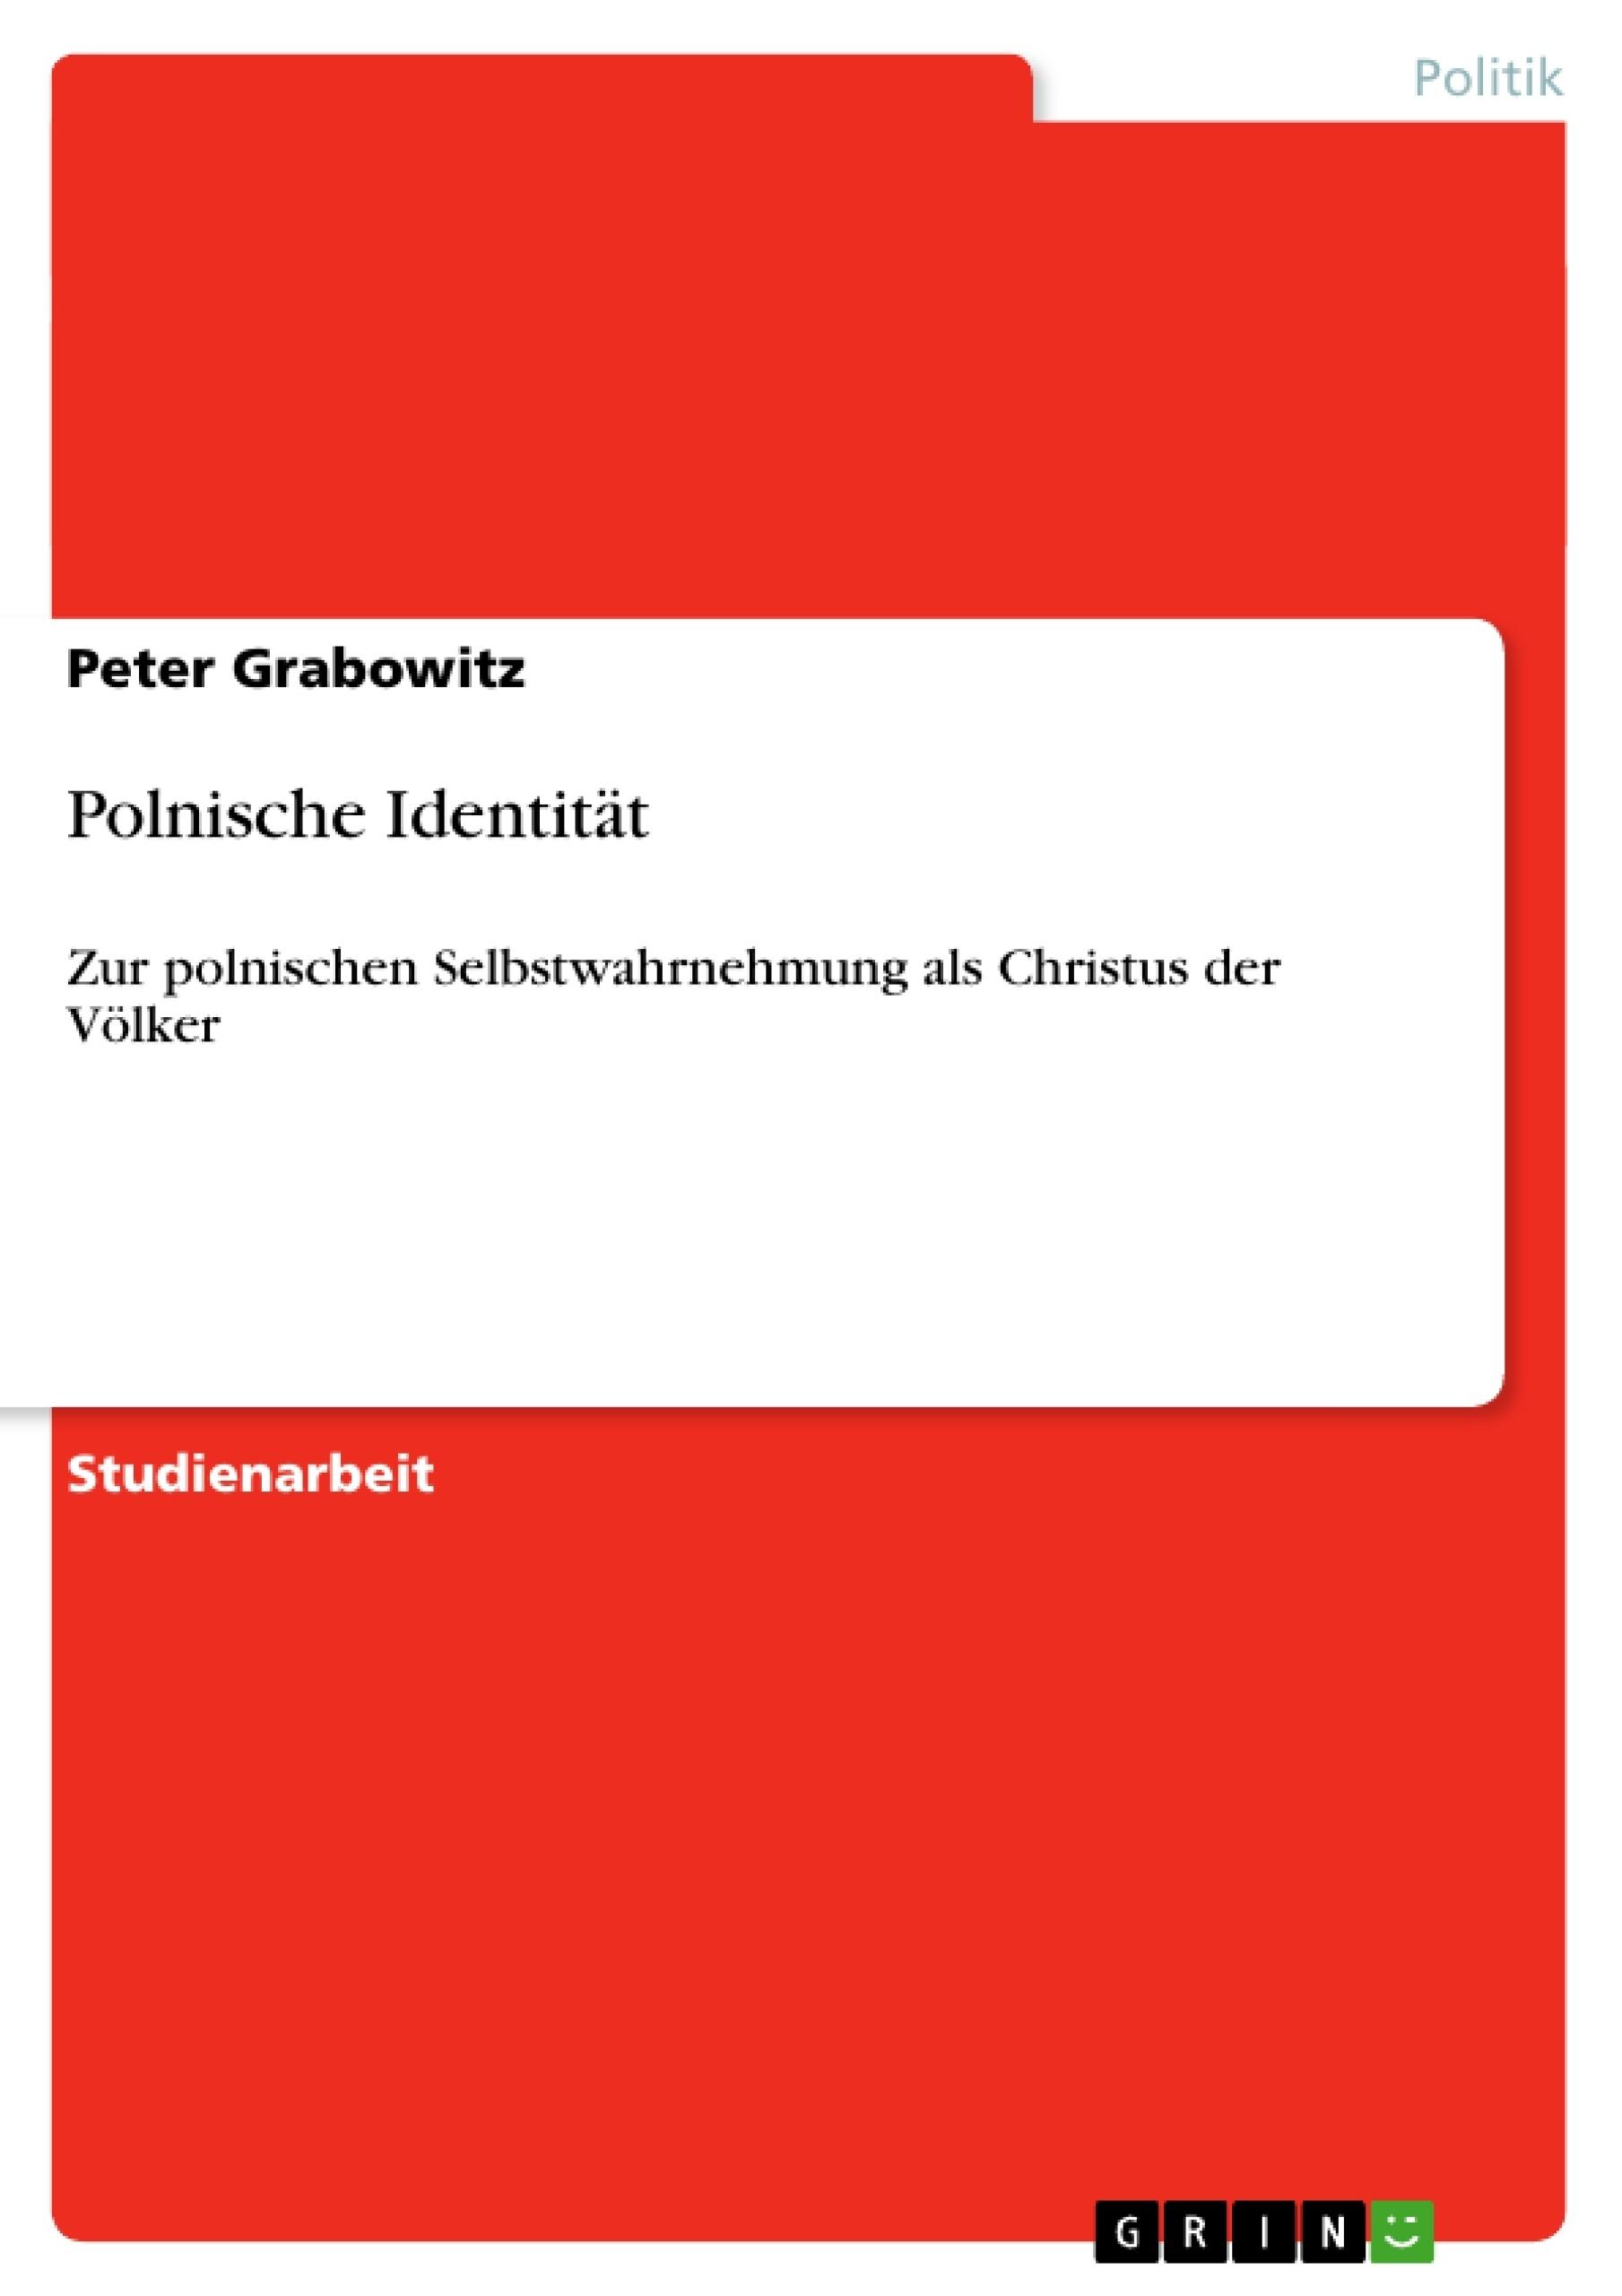 Titel: Polnische Identität